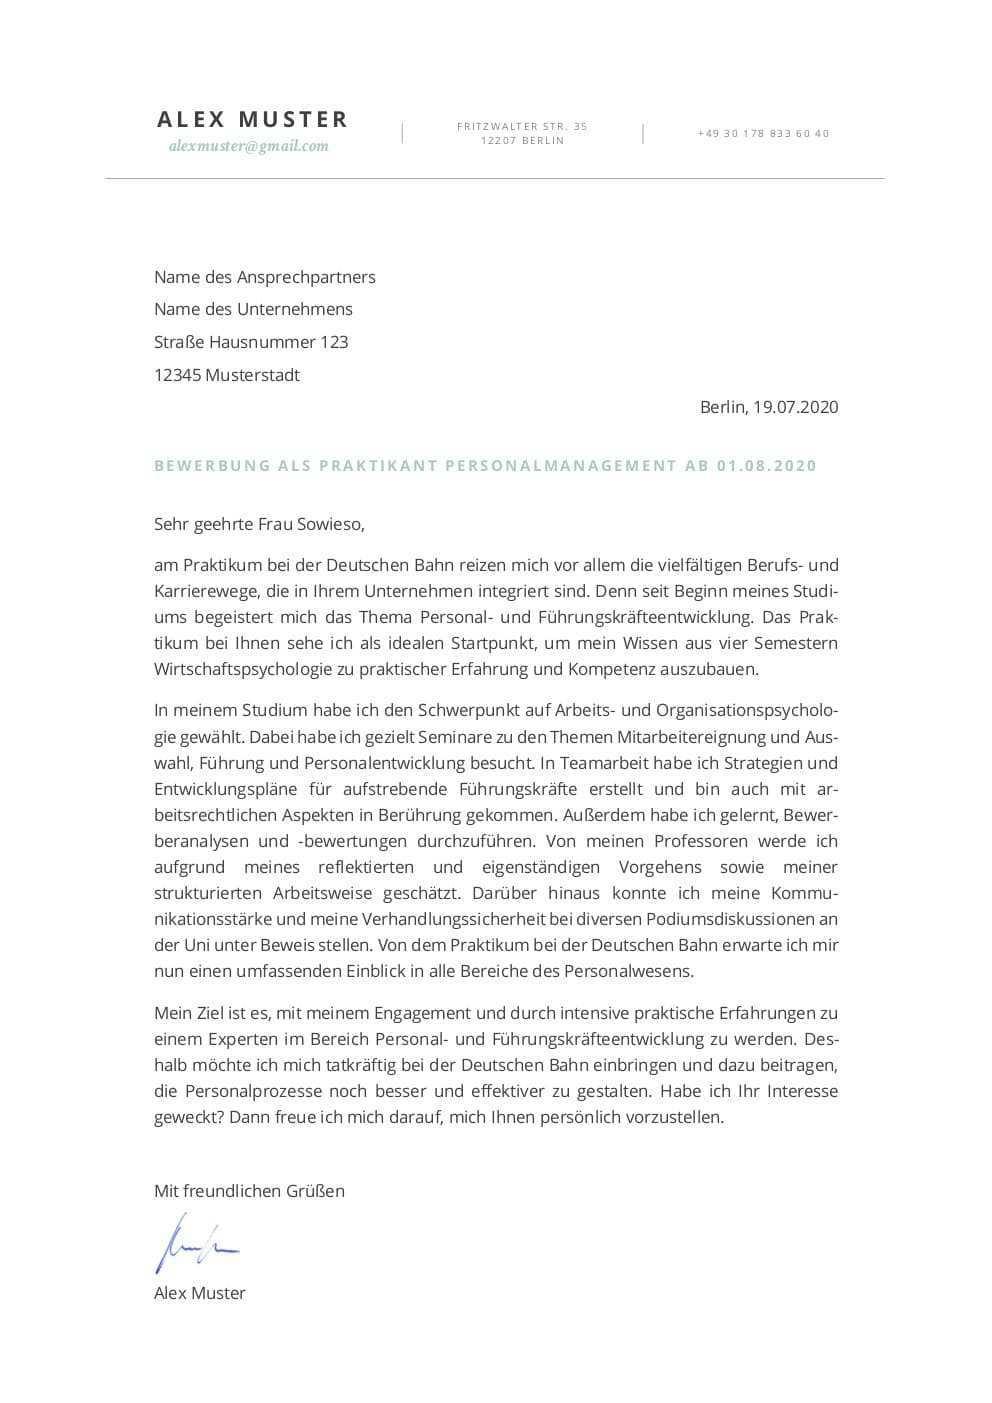 Deutsche Bahn Bewerbung Muster